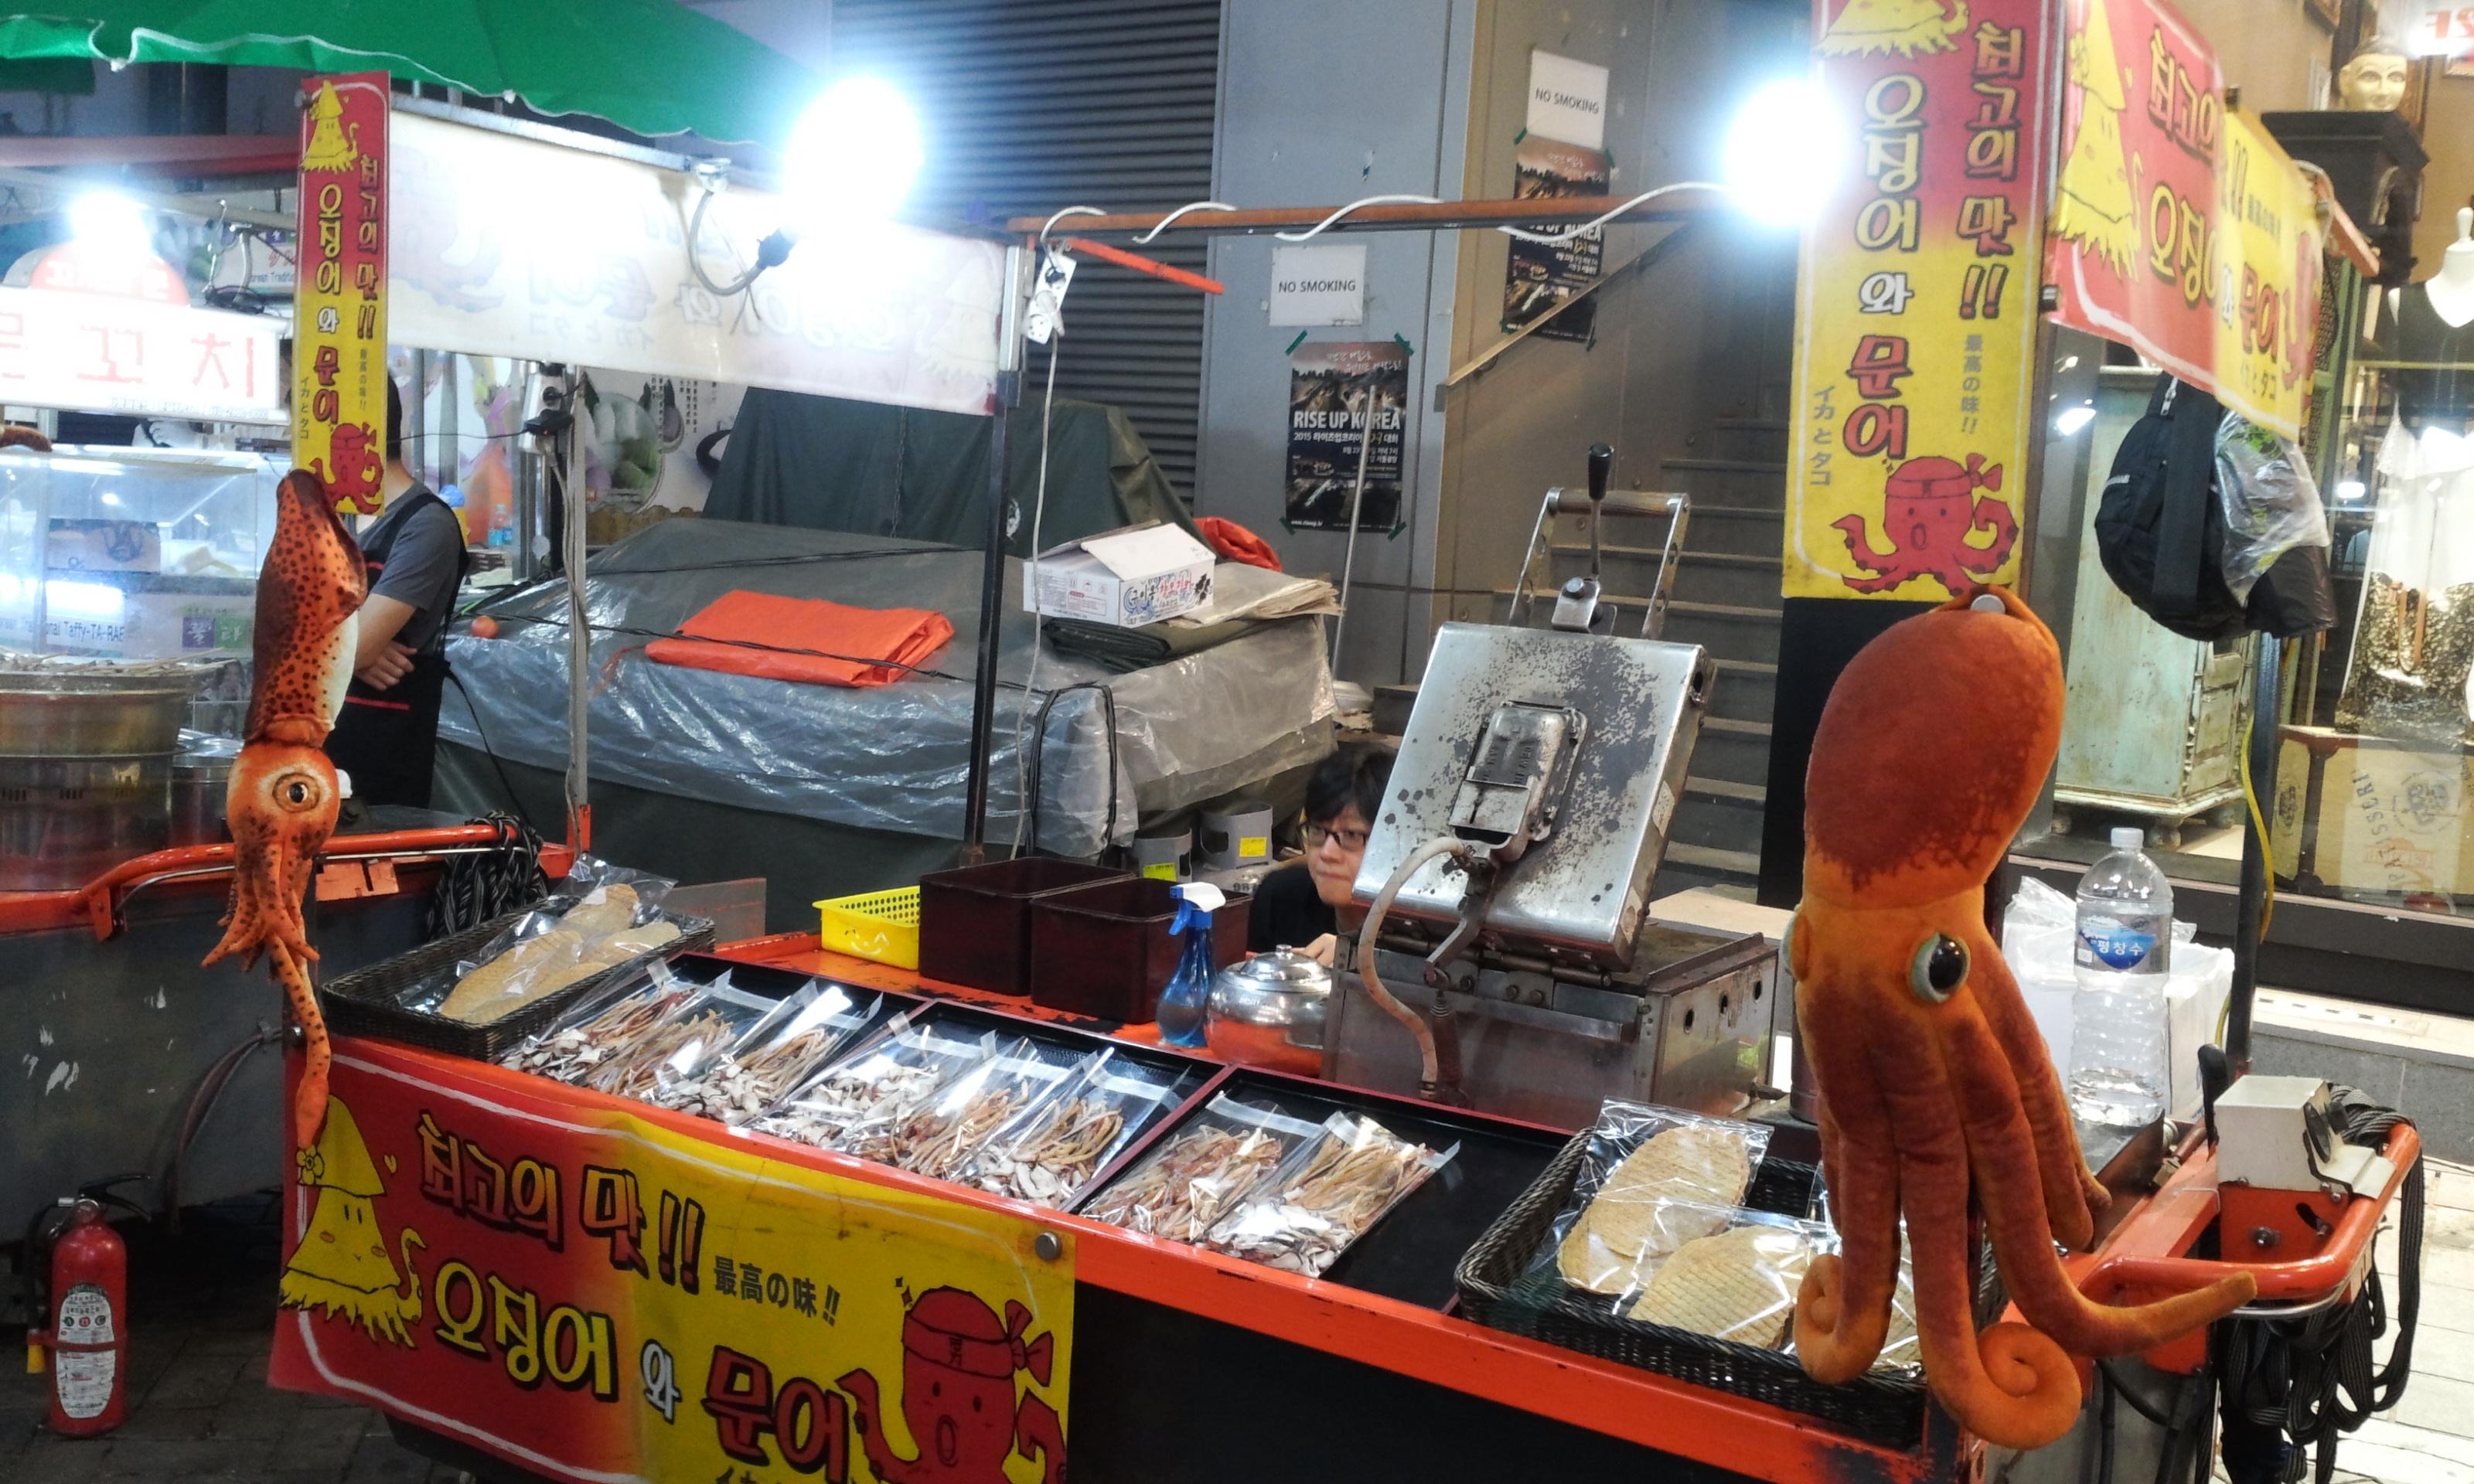 Korean-Street-Food-Dried-Squid-and-Octopus